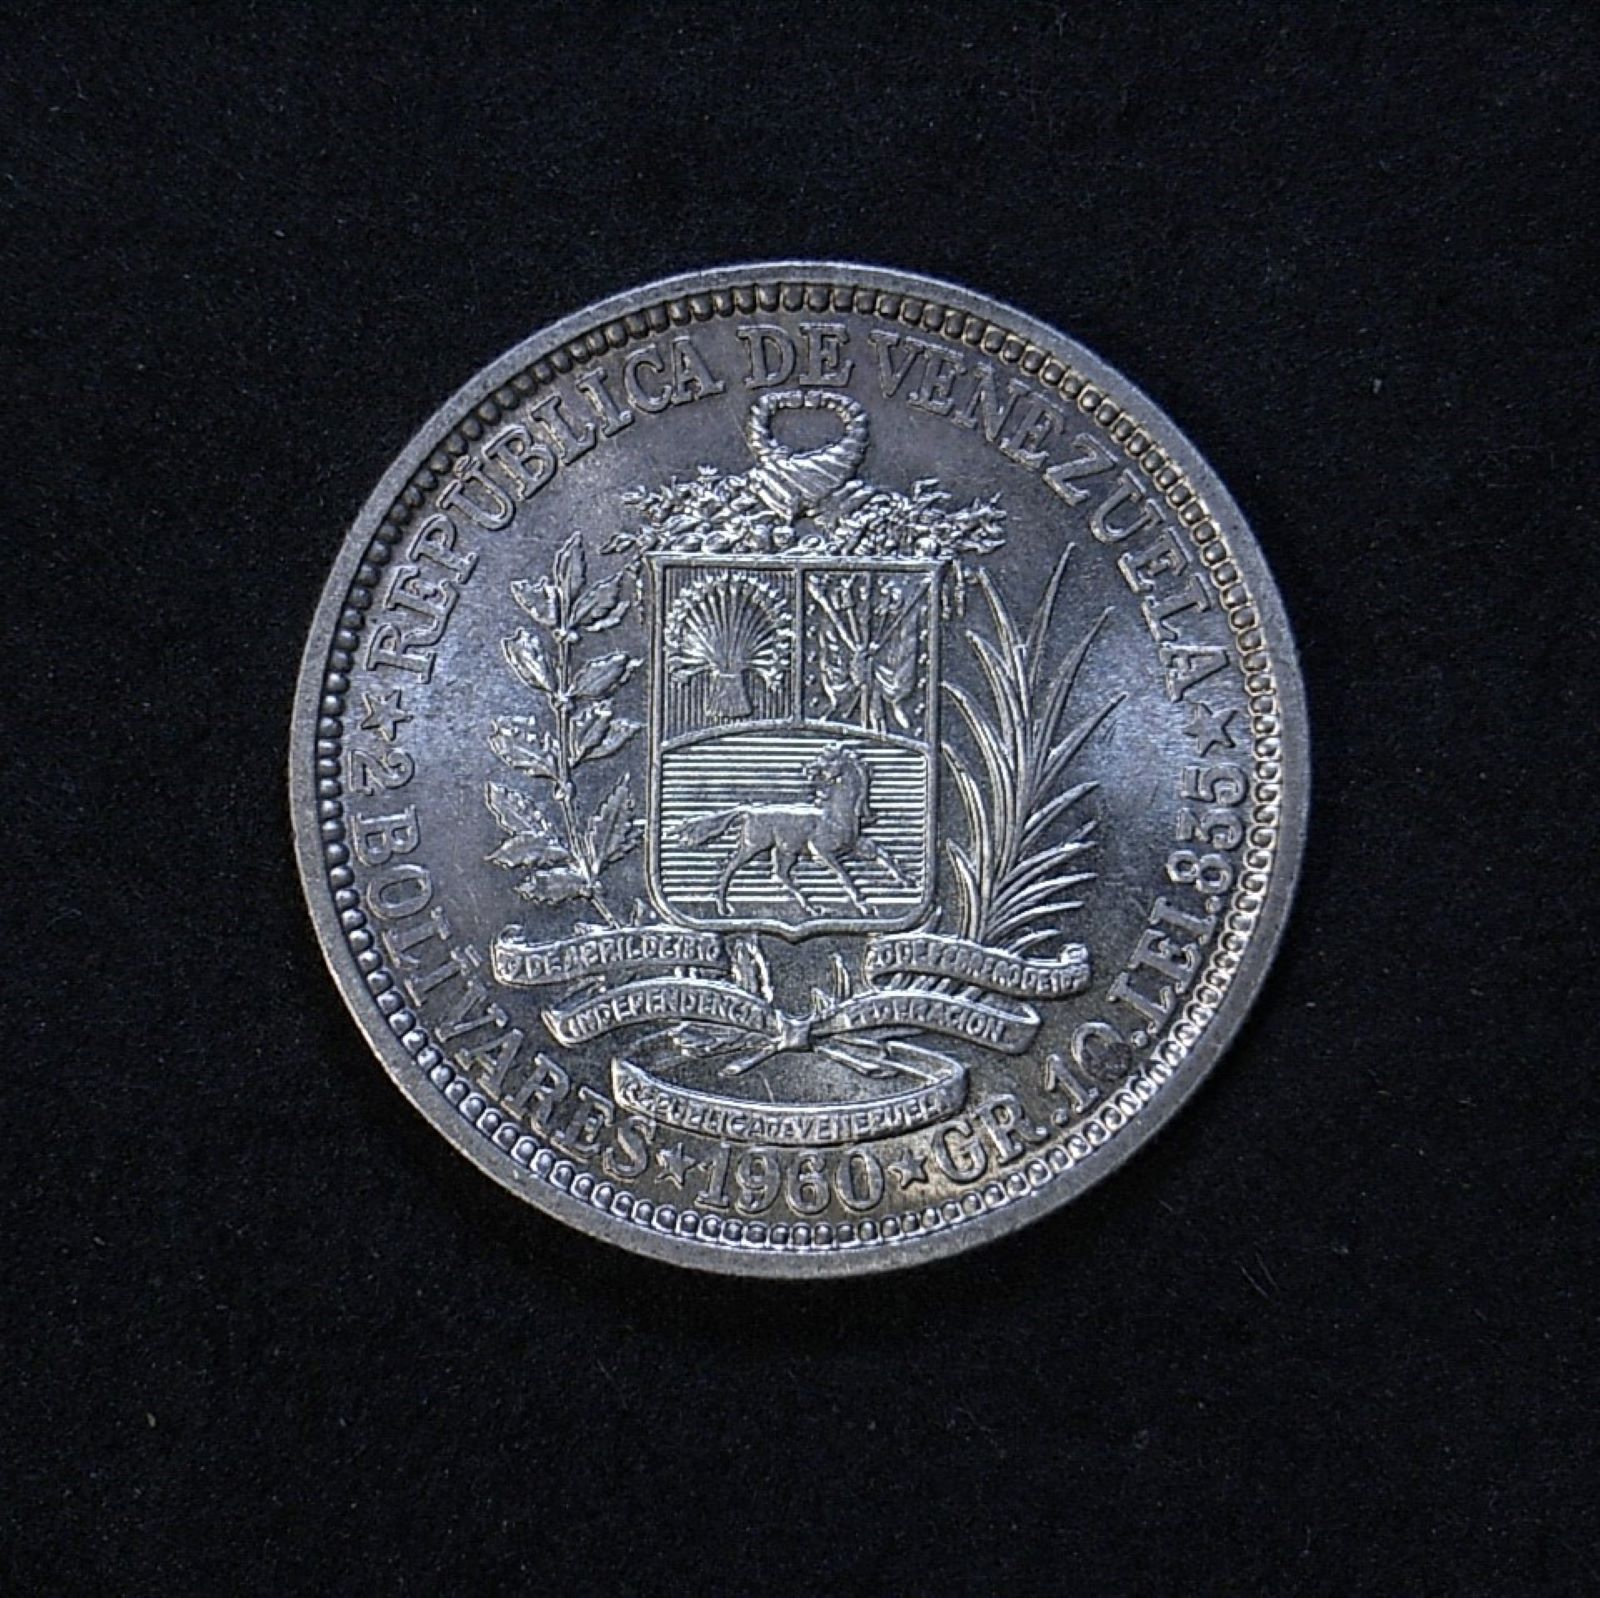 Venezuela 2 Bolivars 1960 rev 1